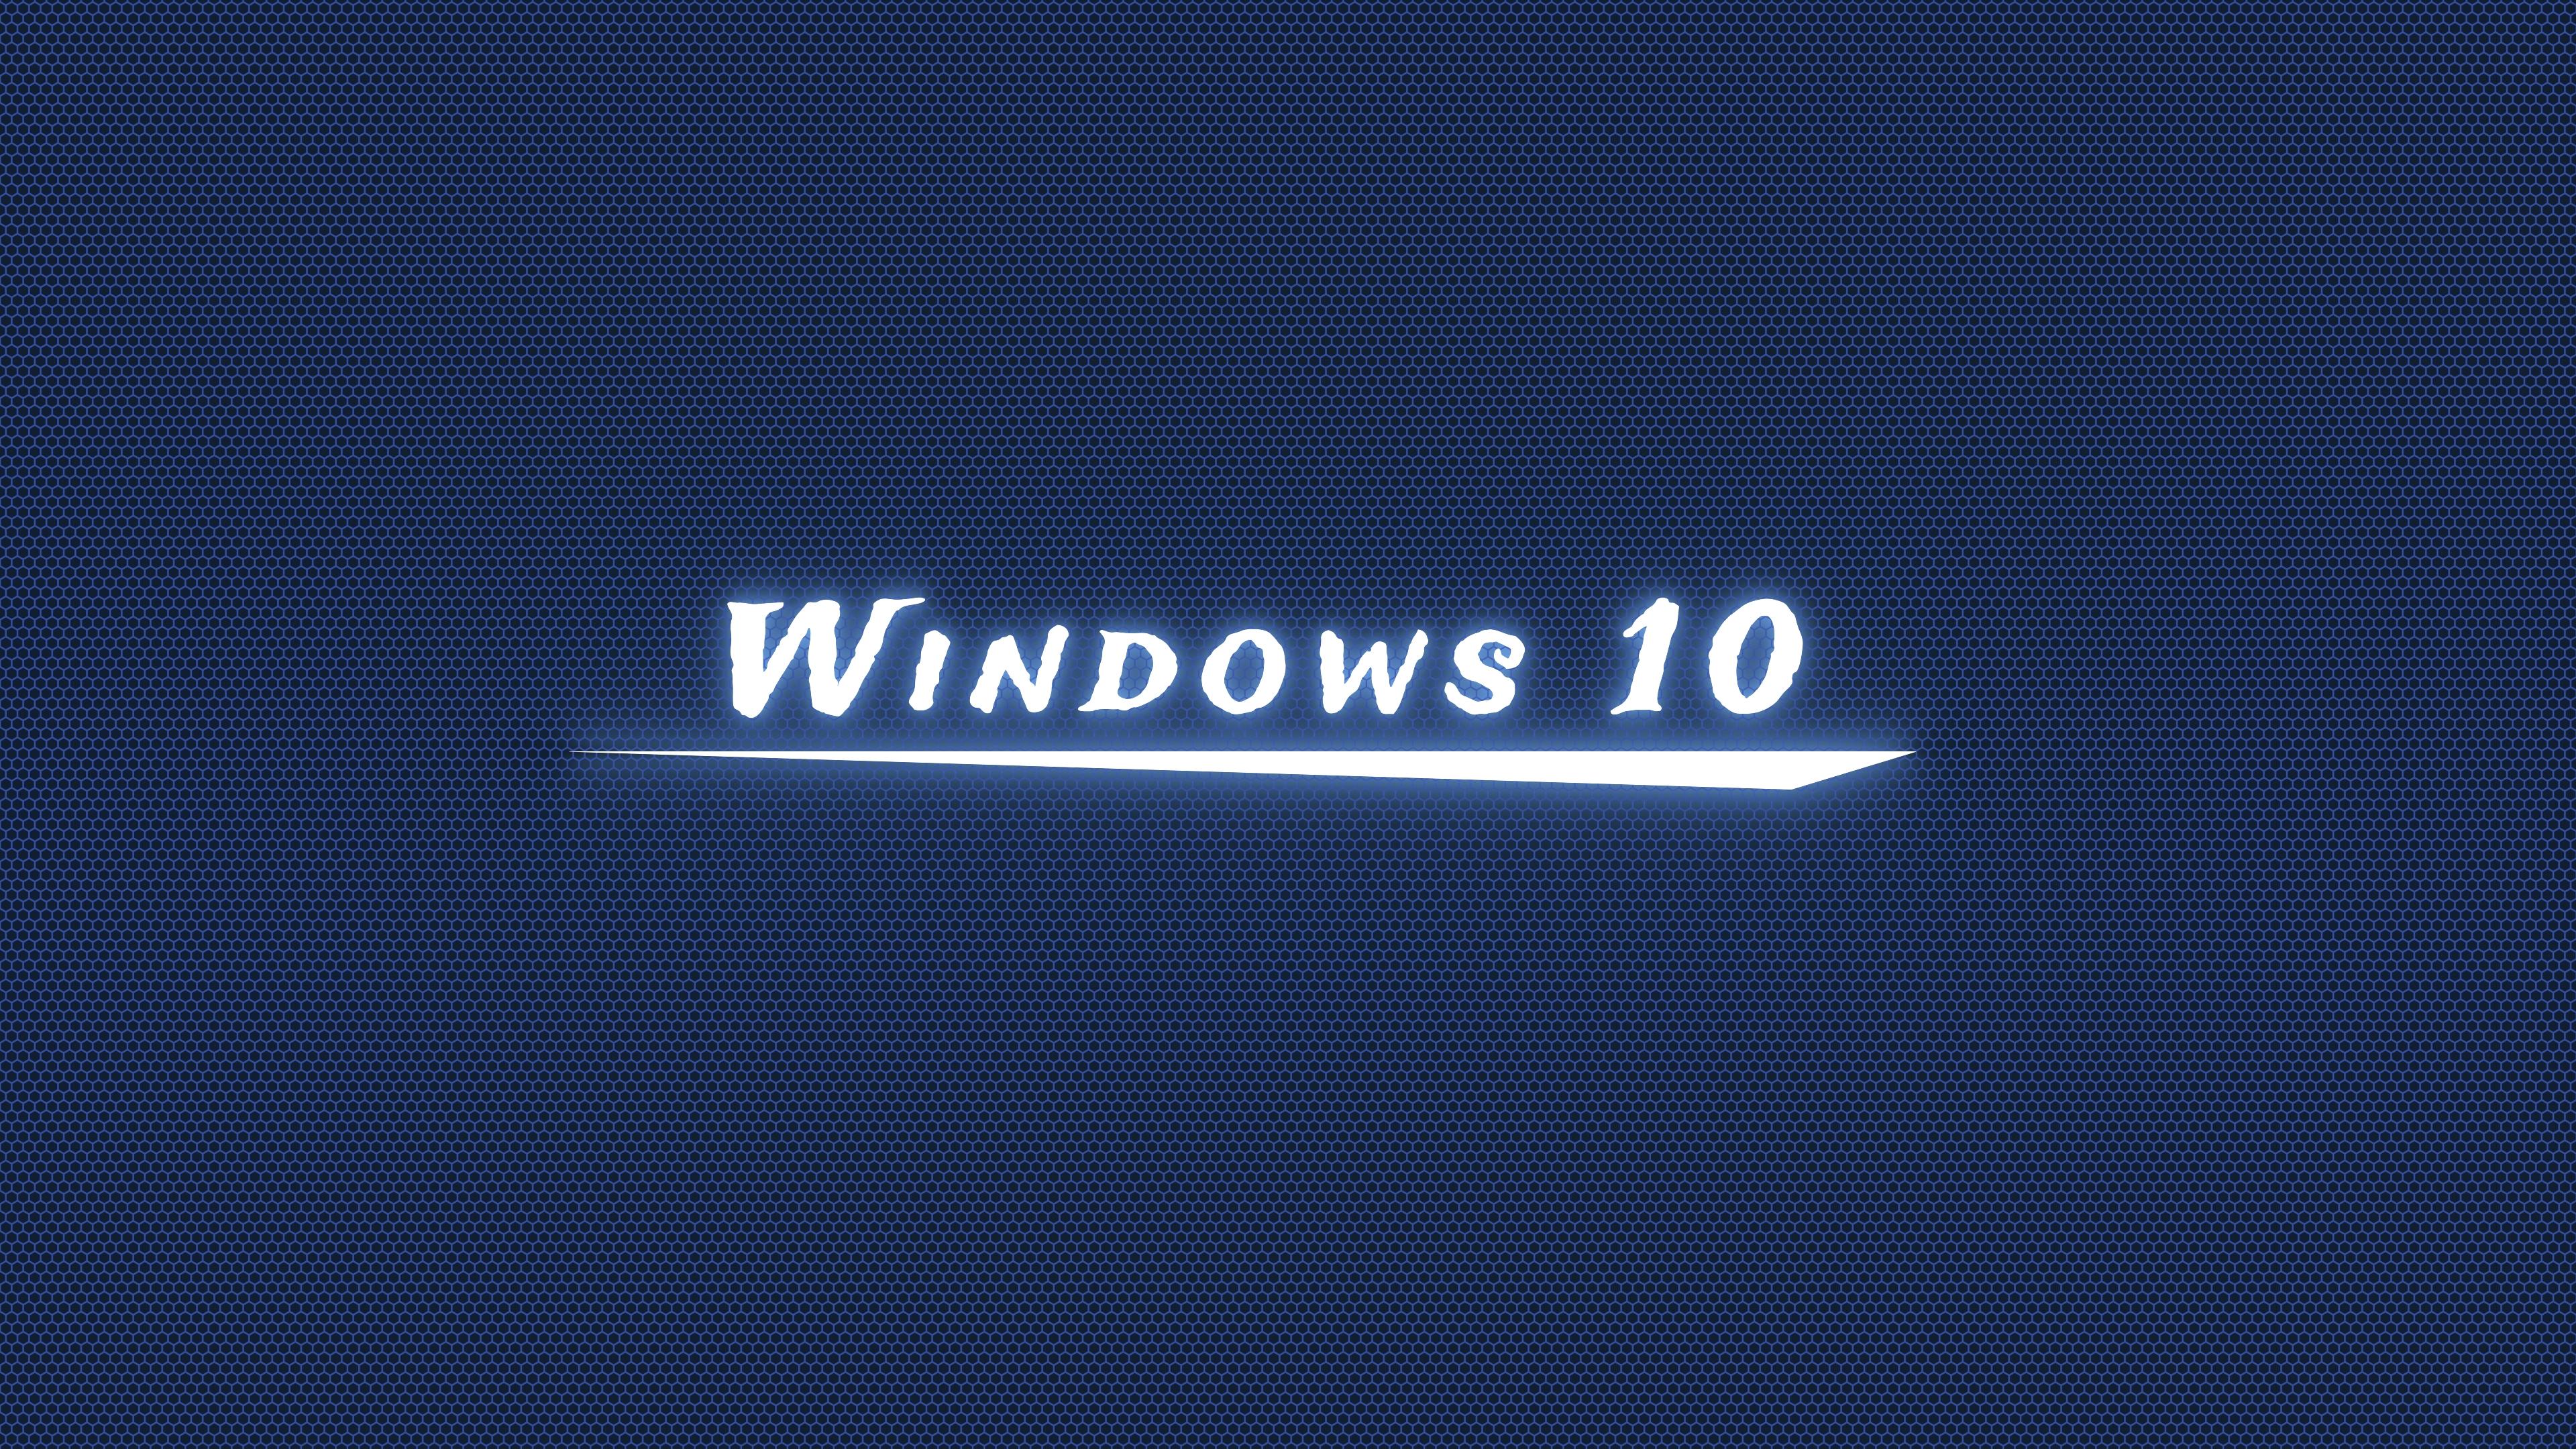 Windows 10 Dark Blue Wallpaper 4k Ultra Hd Wallpaper Background